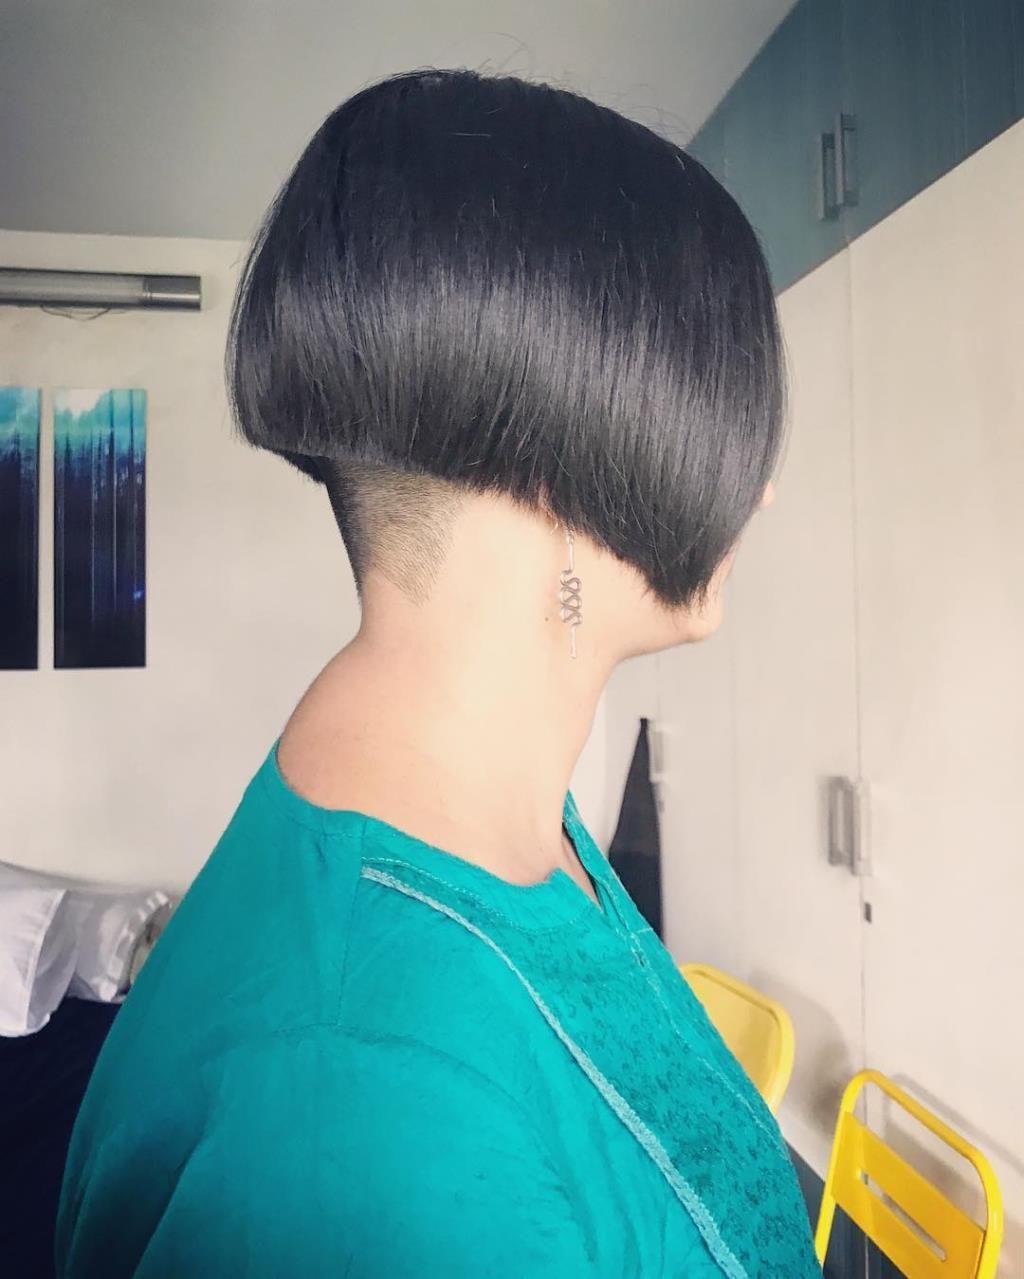 Bob Hair Haircut Headshave And Bald Fetish Blog